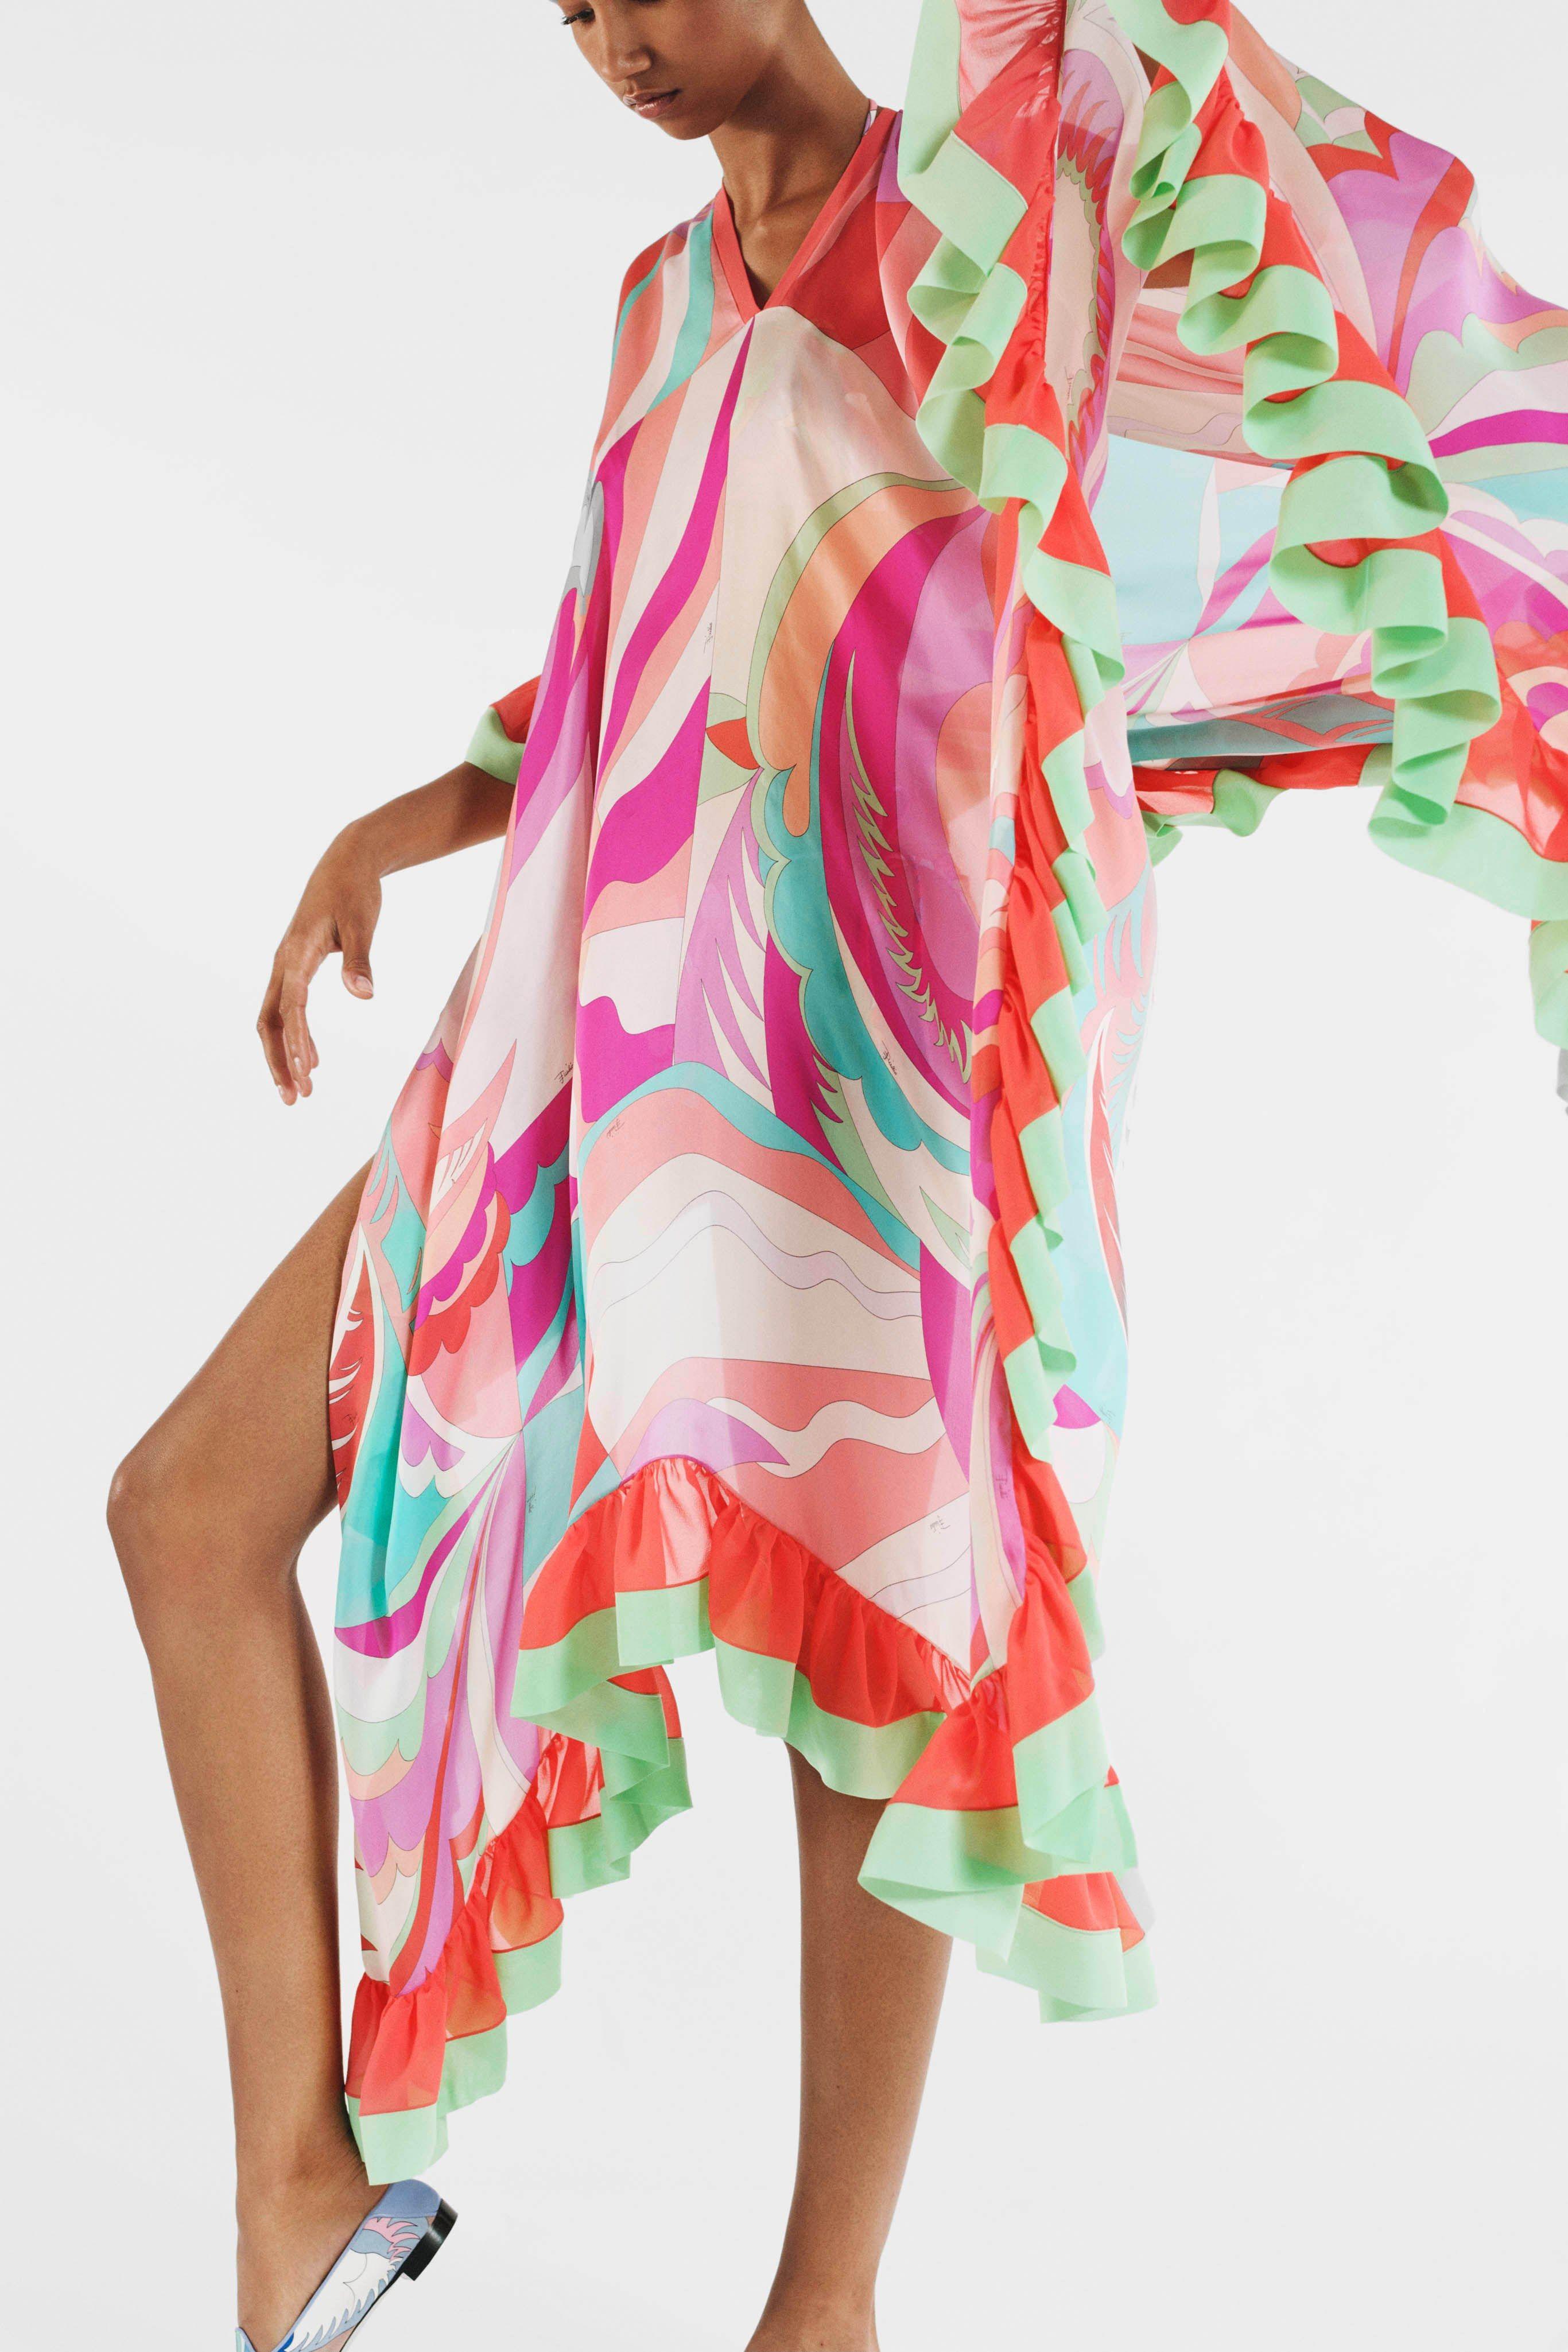 b82b3c0ae3a Emilio Pucci Resort 2019 Milan Collection - Vogue